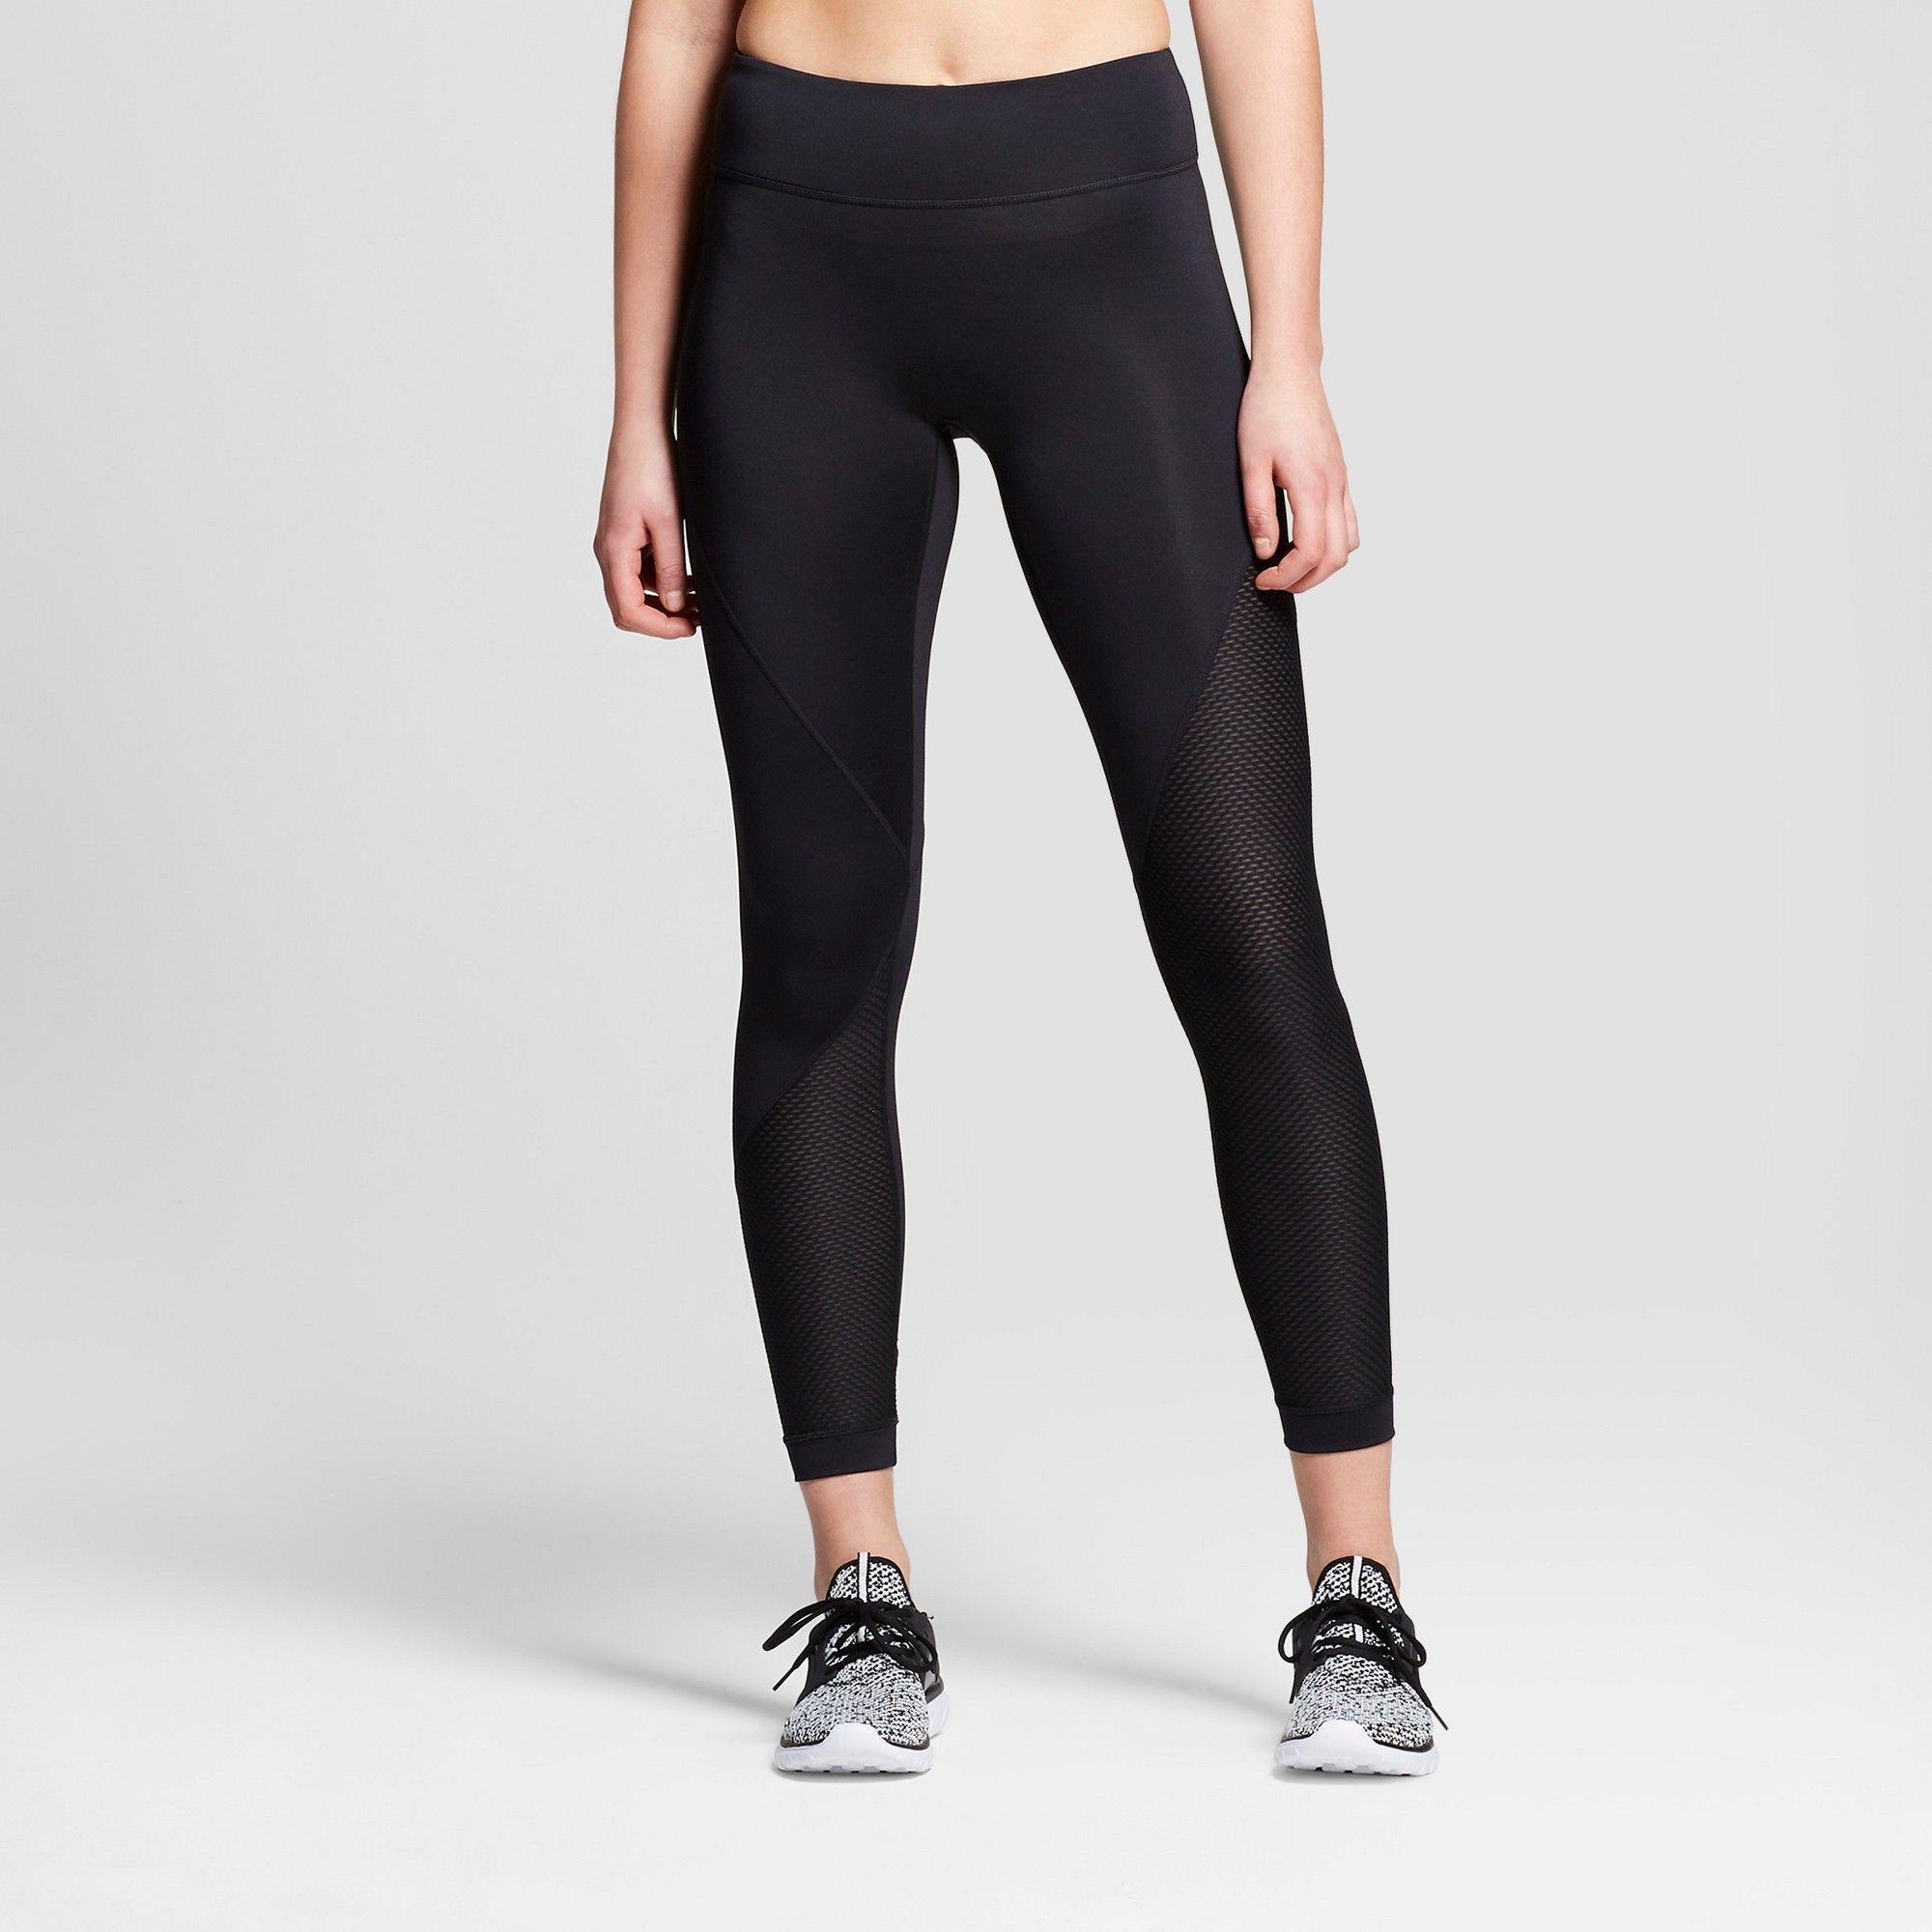 7c87bdae4d17f Women's Performance 7/8 Asymmetrical Mid-Rise Leggings - JoyLab Black Xxl